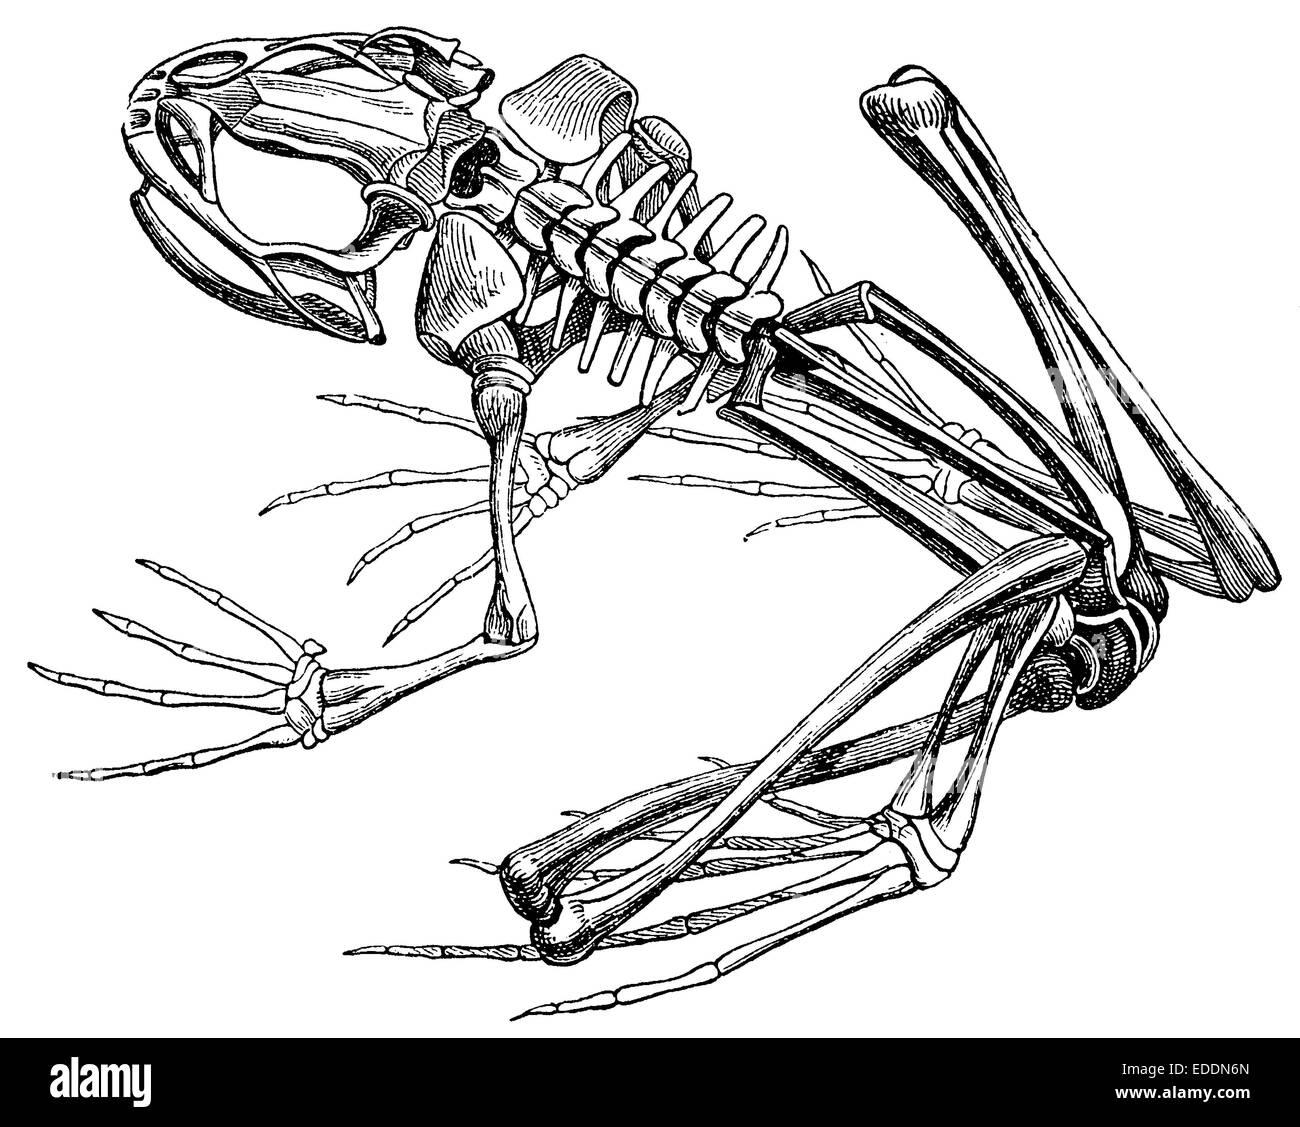 Großzügig Frosch Skelett Anatomie Bilder - Anatomie Ideen - finotti.info